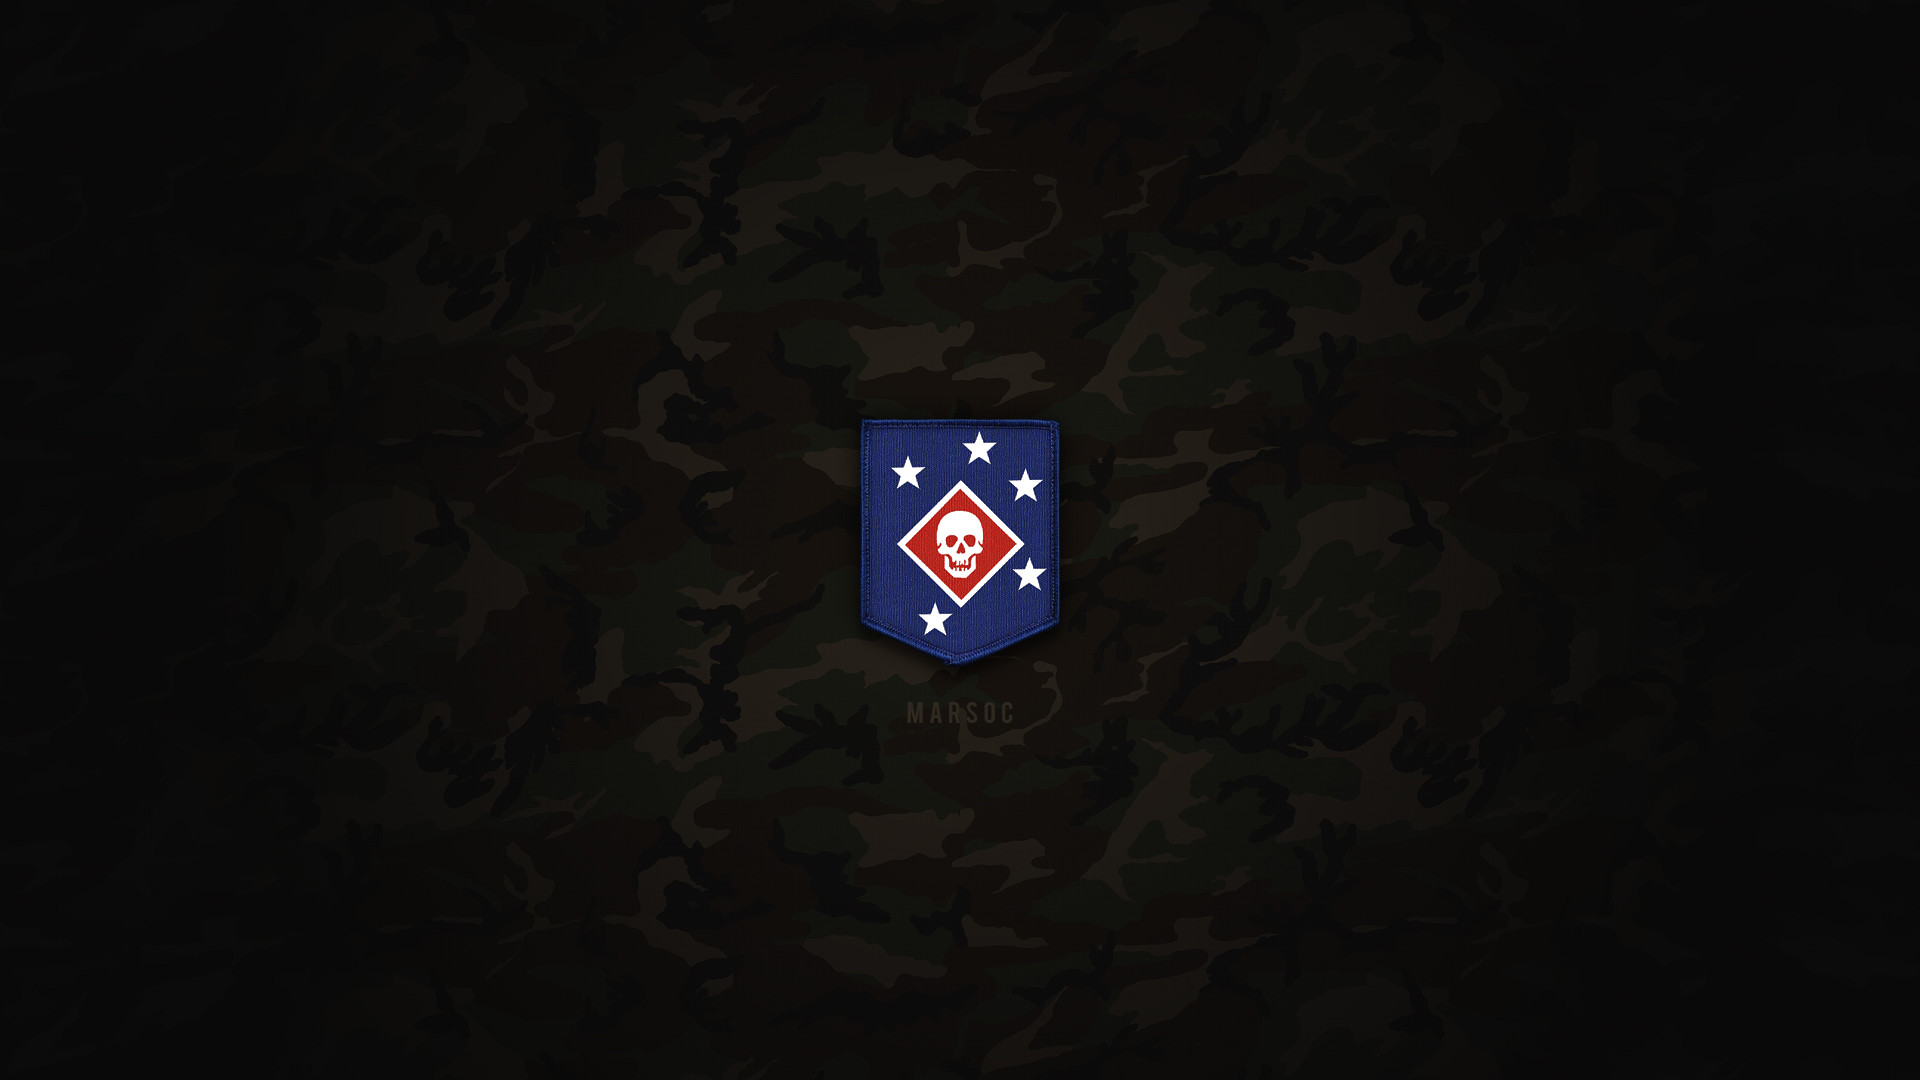 … Marine Raider Patch | MARSOC | HD Wallpaper by ignitedkaos